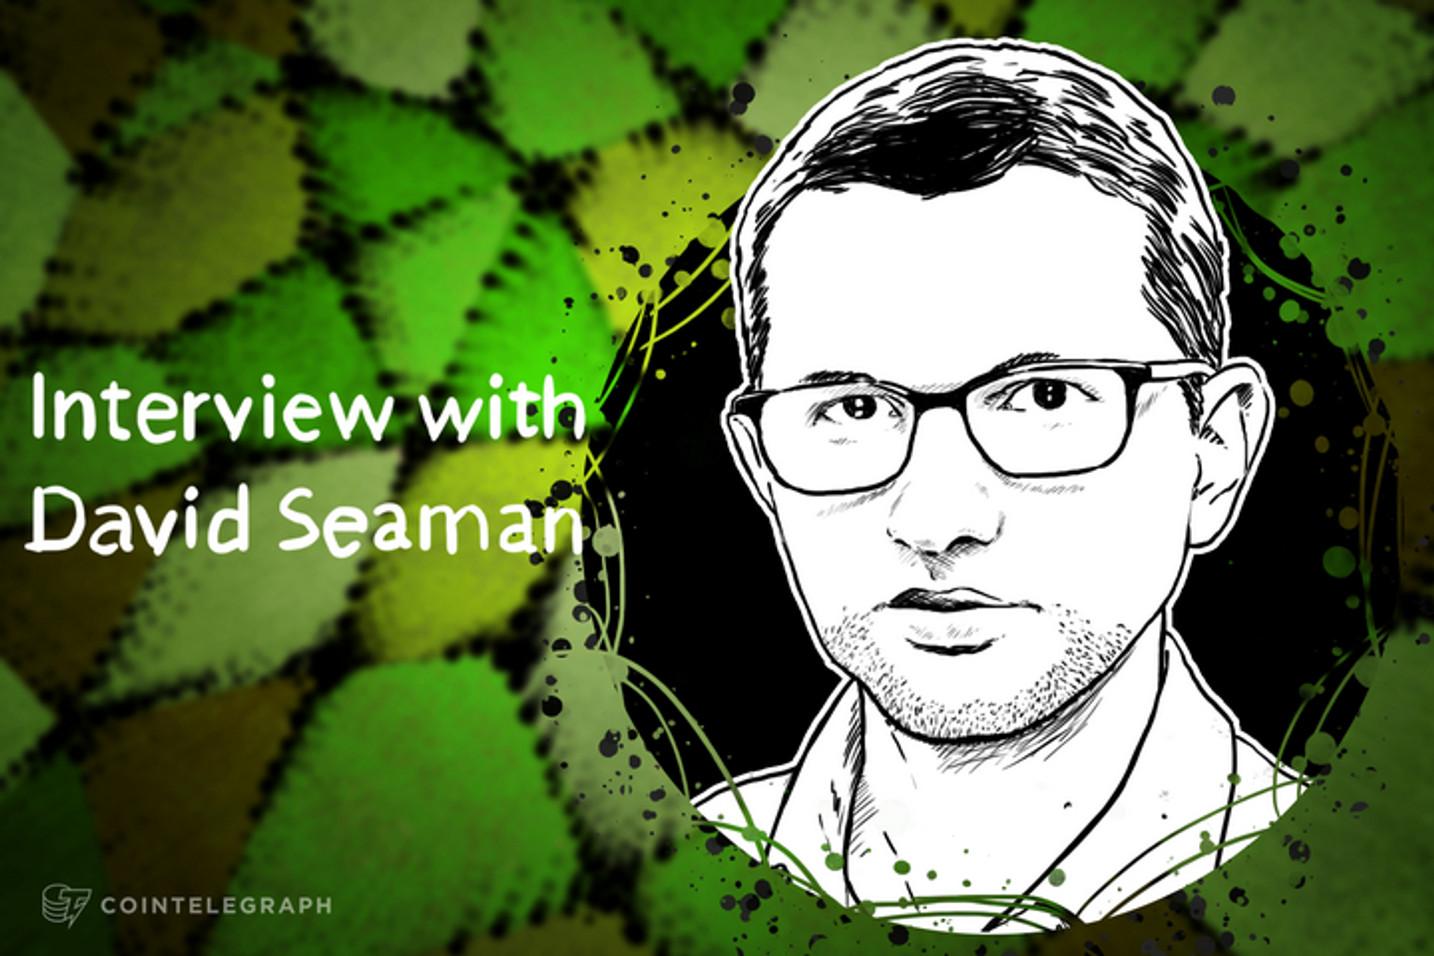 David Seaman: 'Stop Competing and Just Make Everything Interoperable'